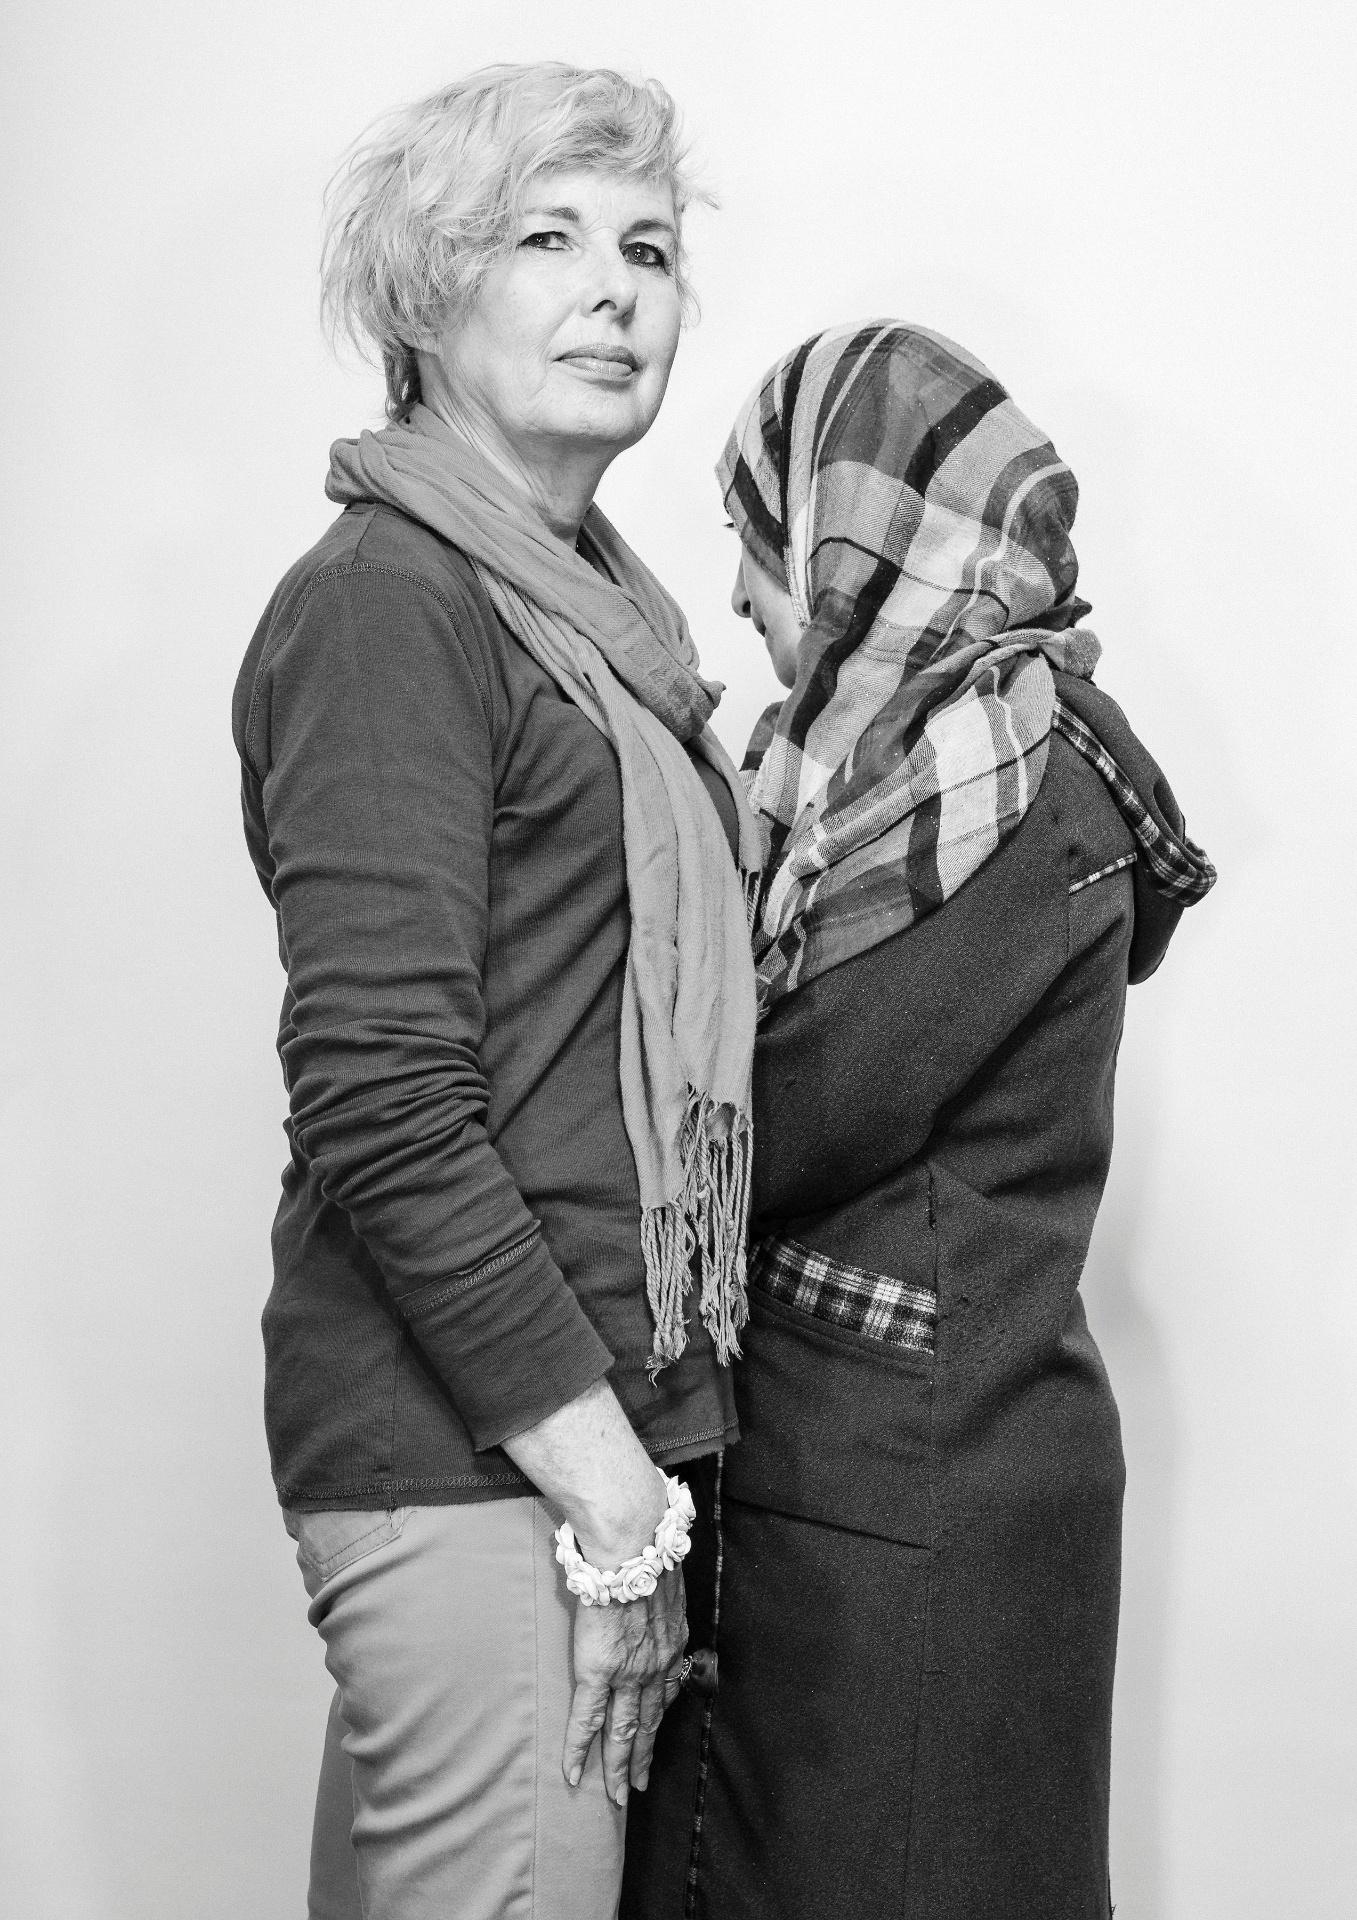 21.mai.2016 - Susan Stewart é artista e patrocinadora de Eman Mohammad (dir.). A família da refugiada veio da Síria para o Canadá